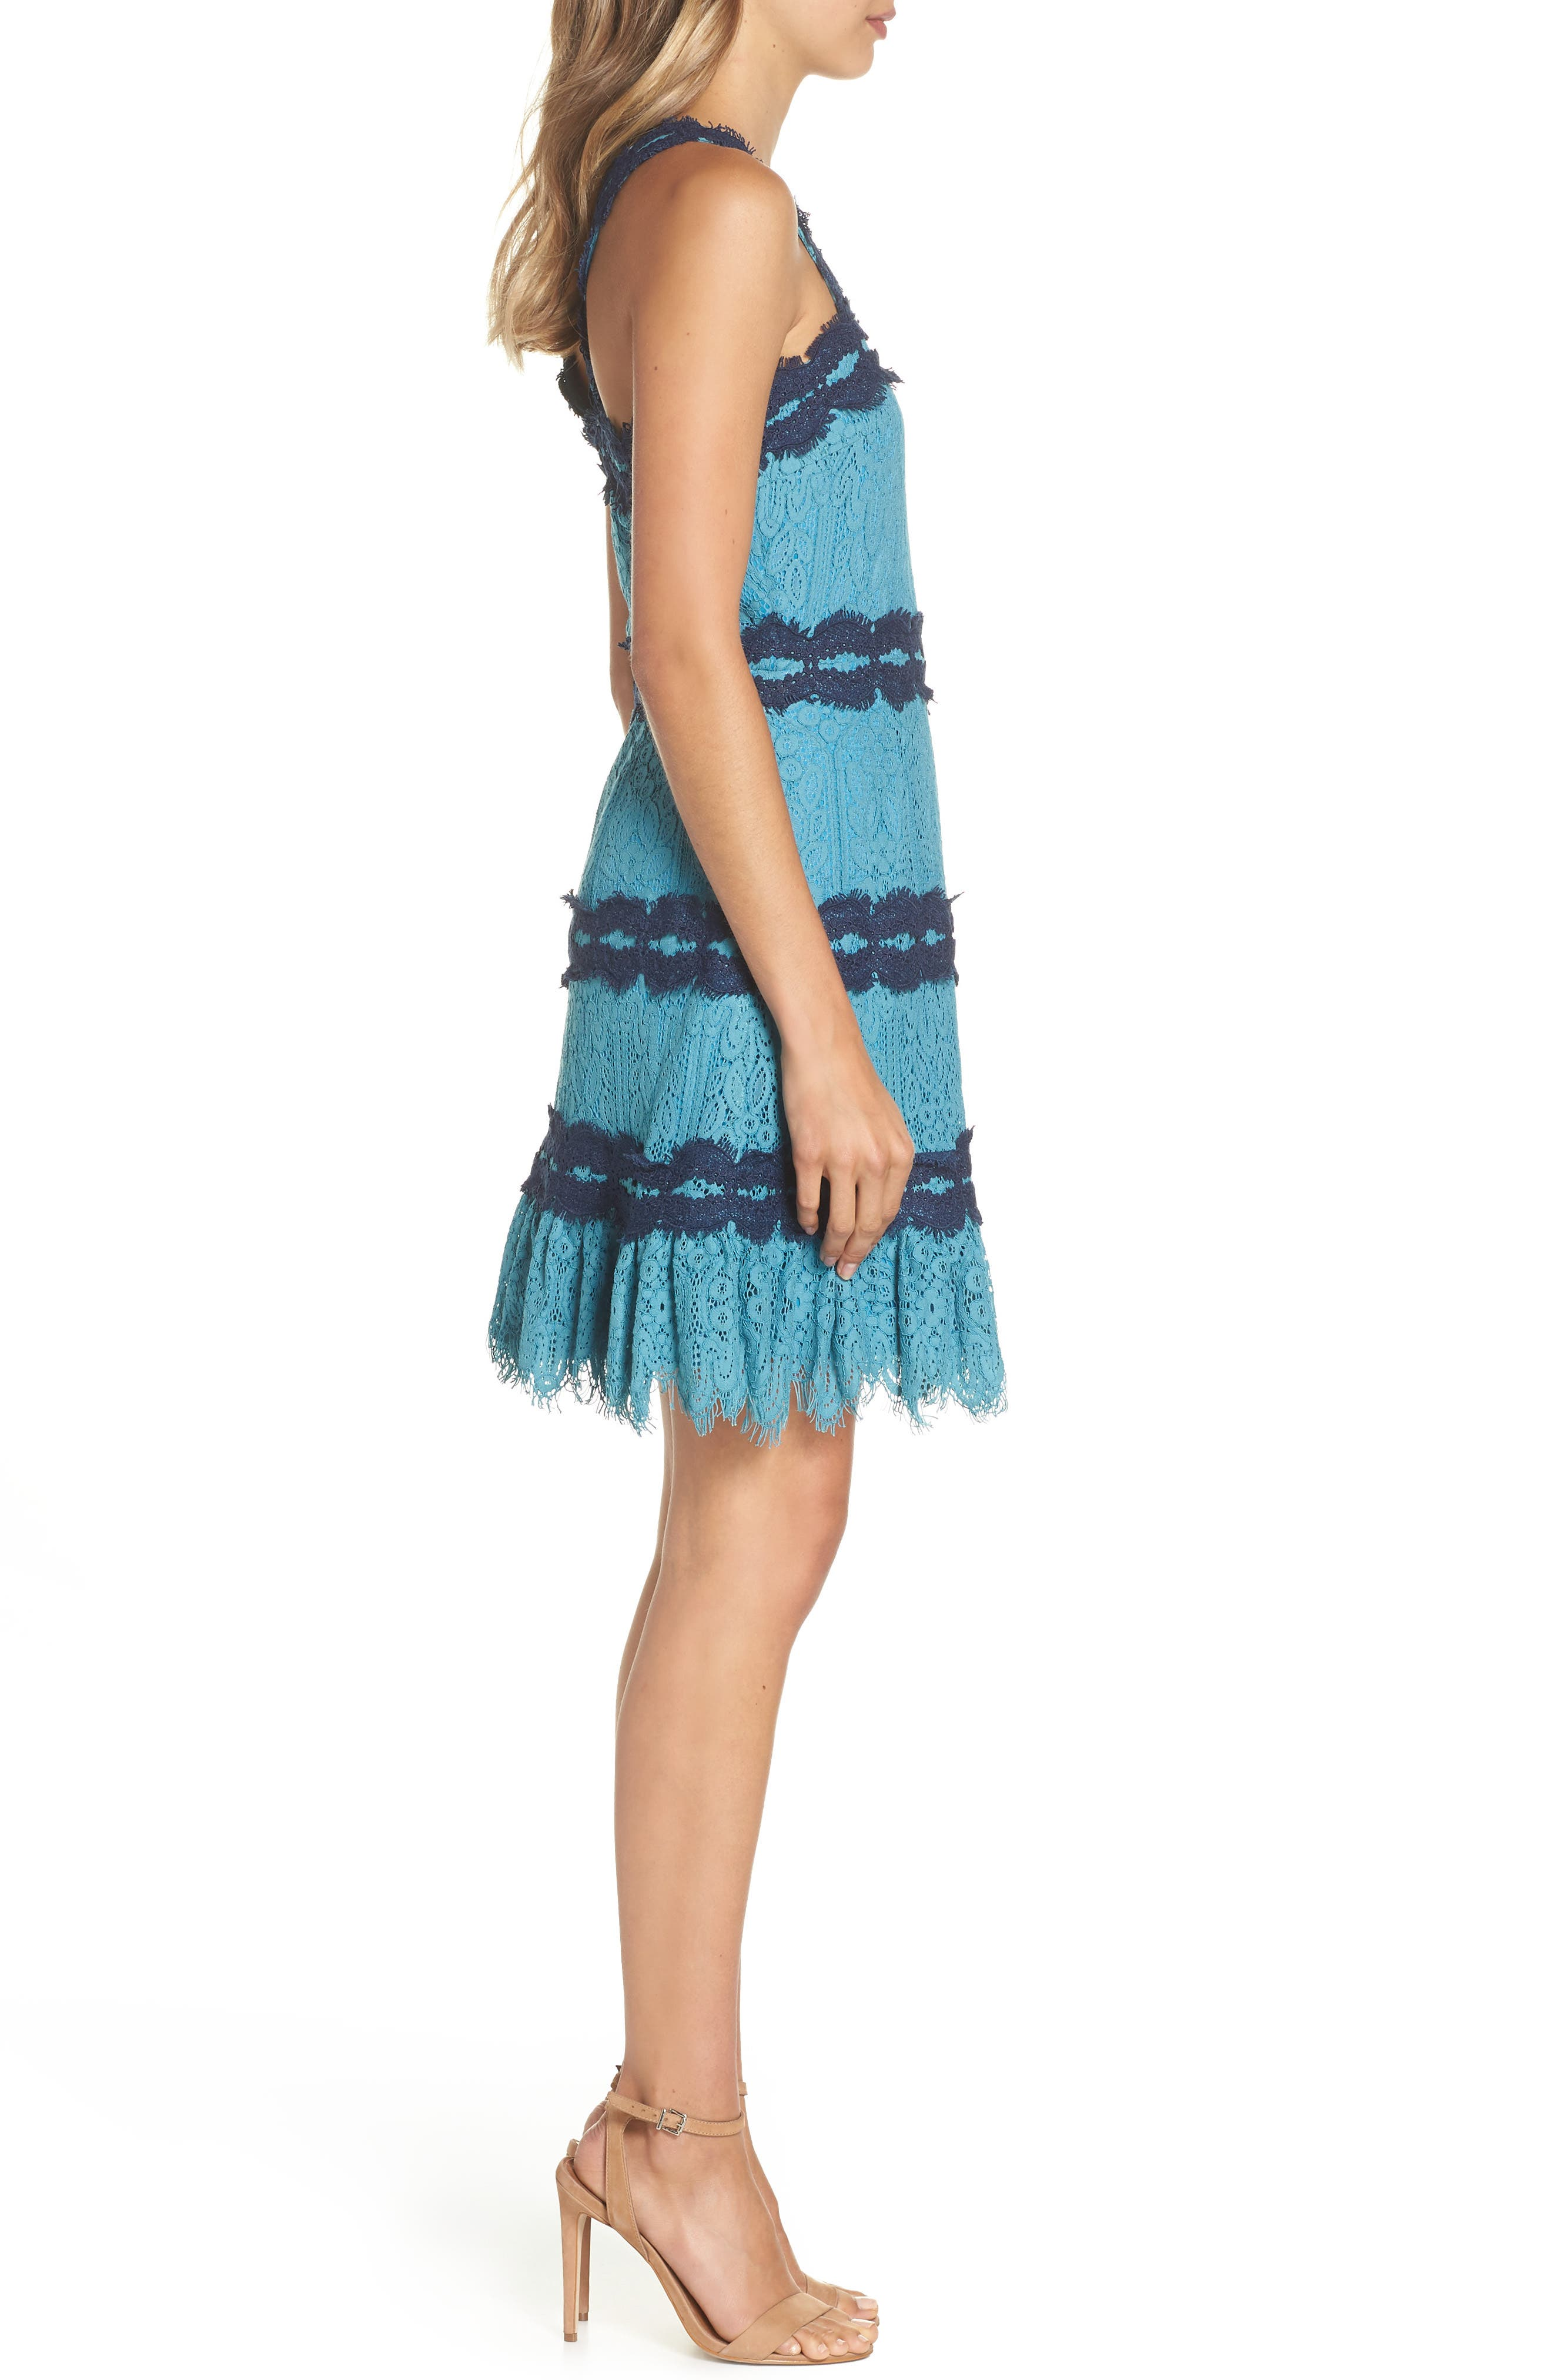 Lula Ruffle Lace Dress,                             Alternate thumbnail 3, color,                             TEAL/ NAVY